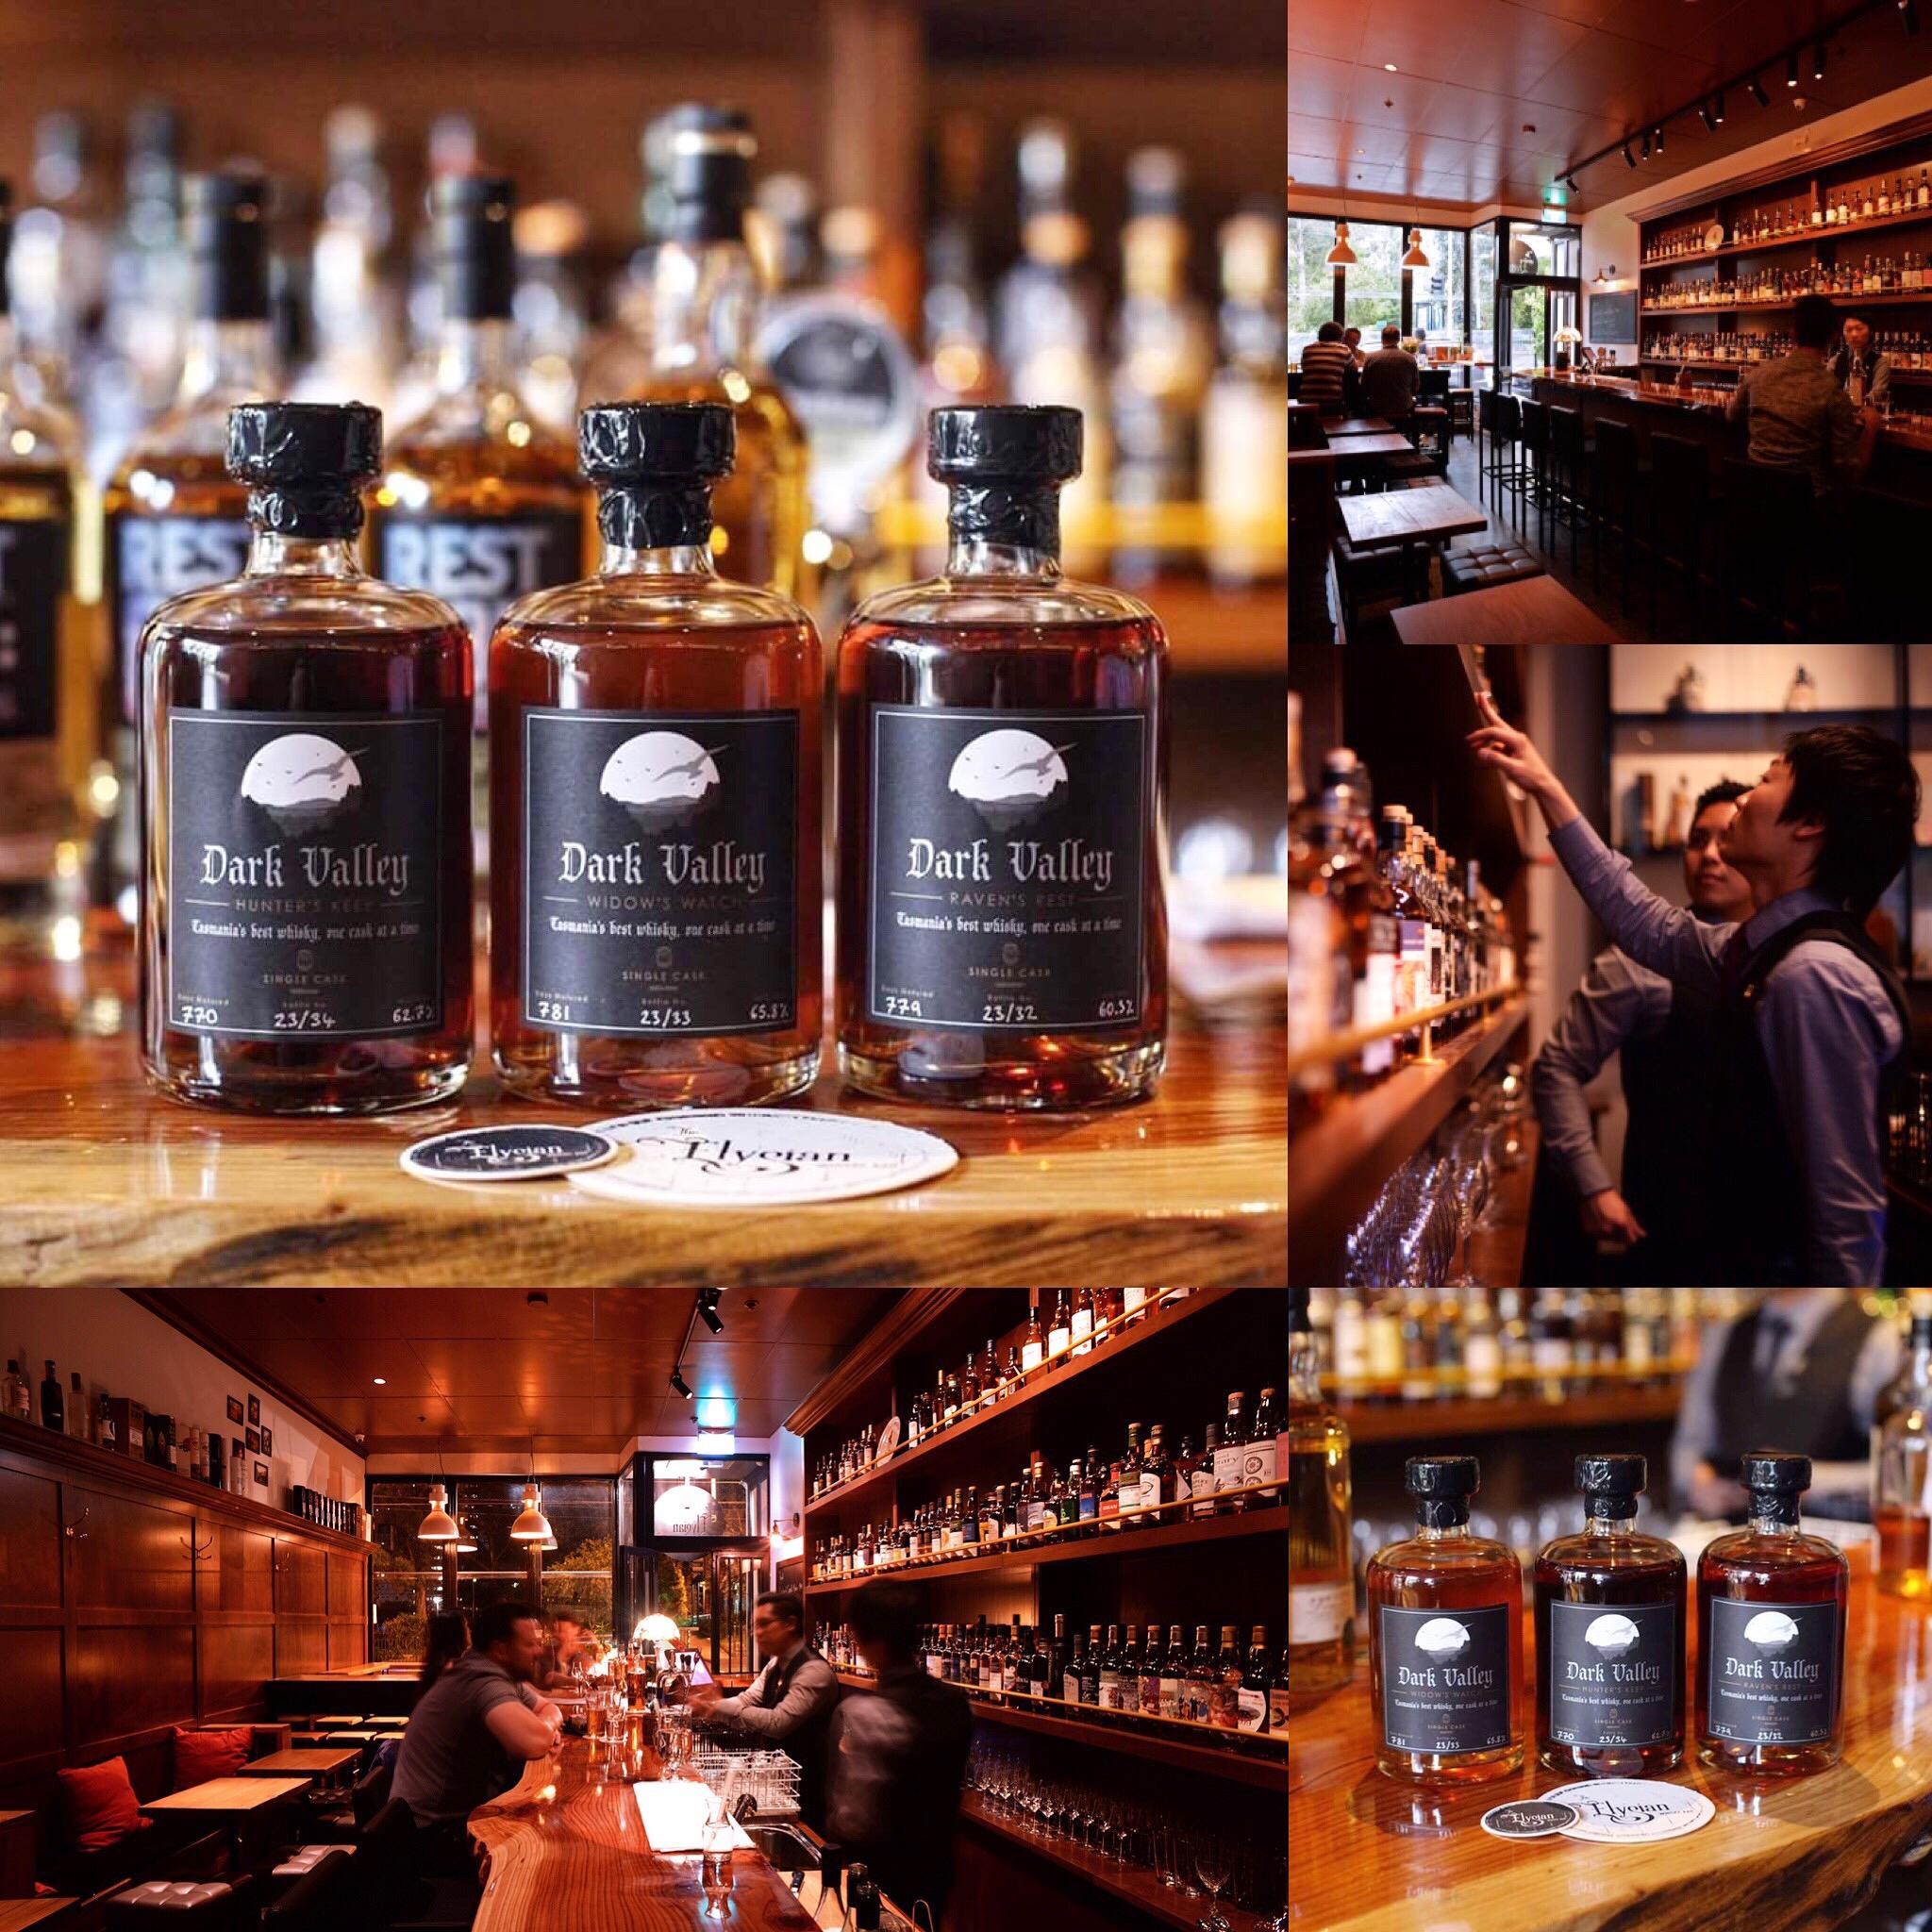 Dark Bars - Dark Valley Whisky